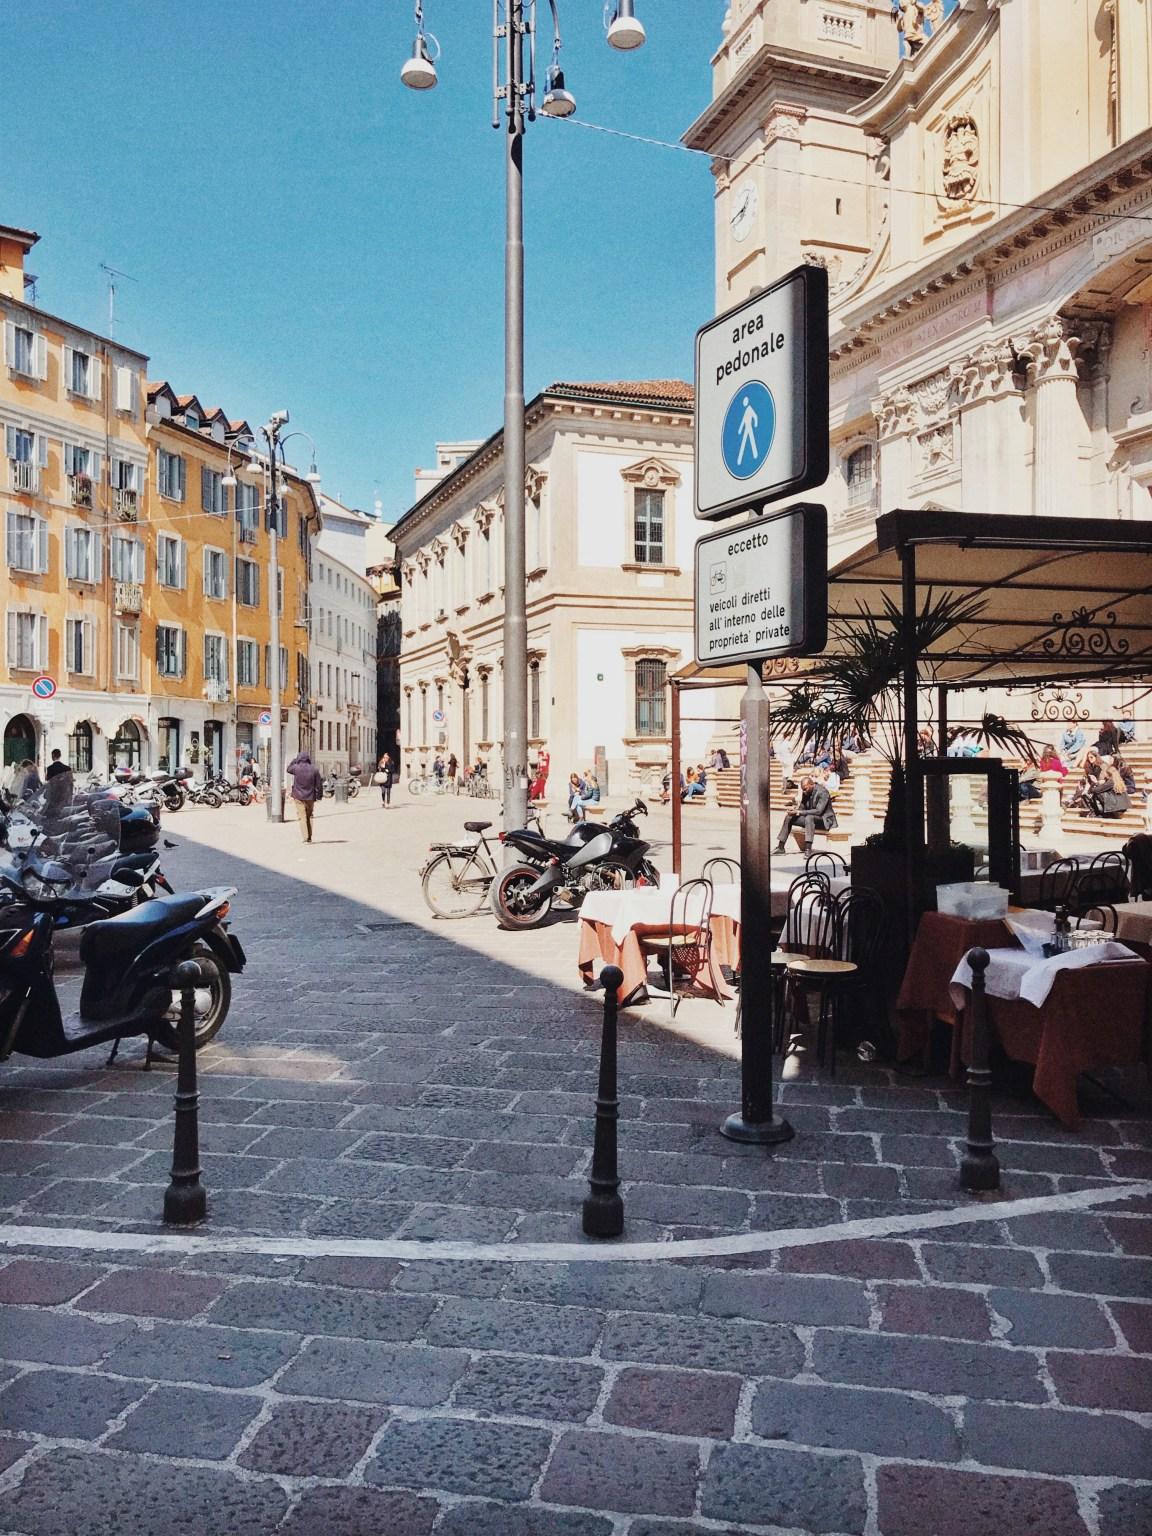 Mysigaste torget i Milano, Piazza Sant\'Alessandro